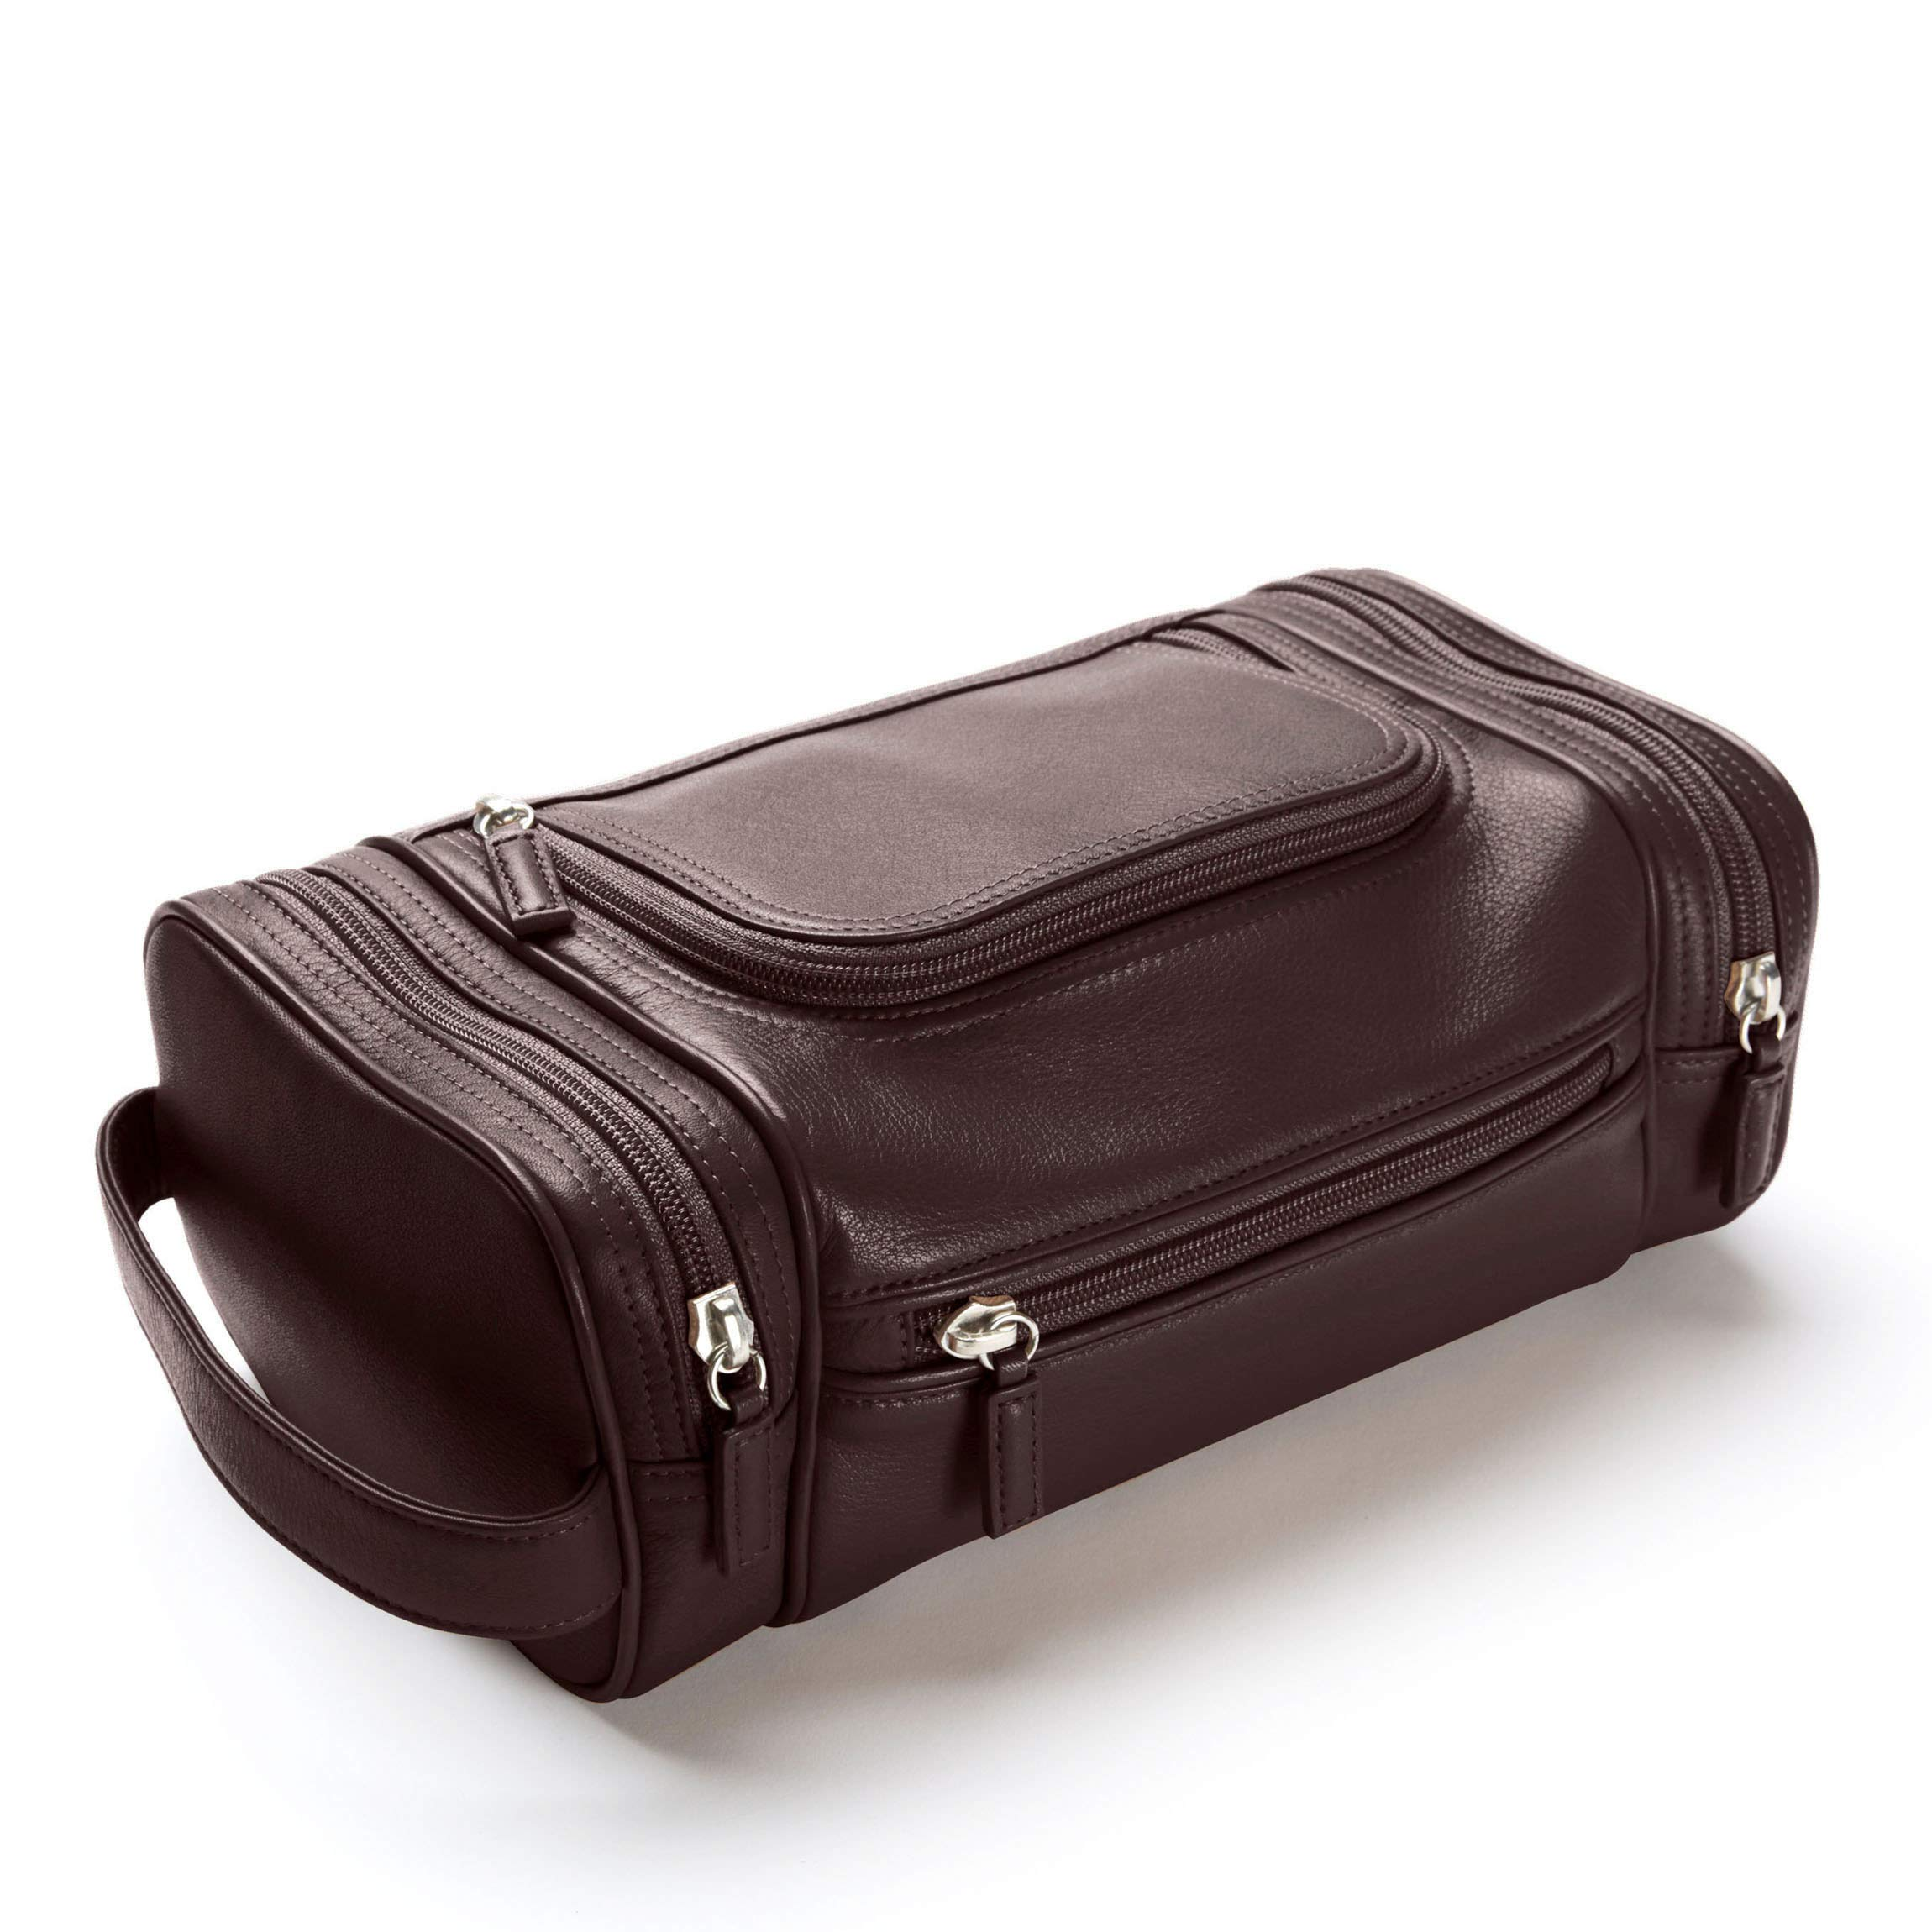 Leatherology Brown Multi Pocket Toiletry Bag by Leatherology